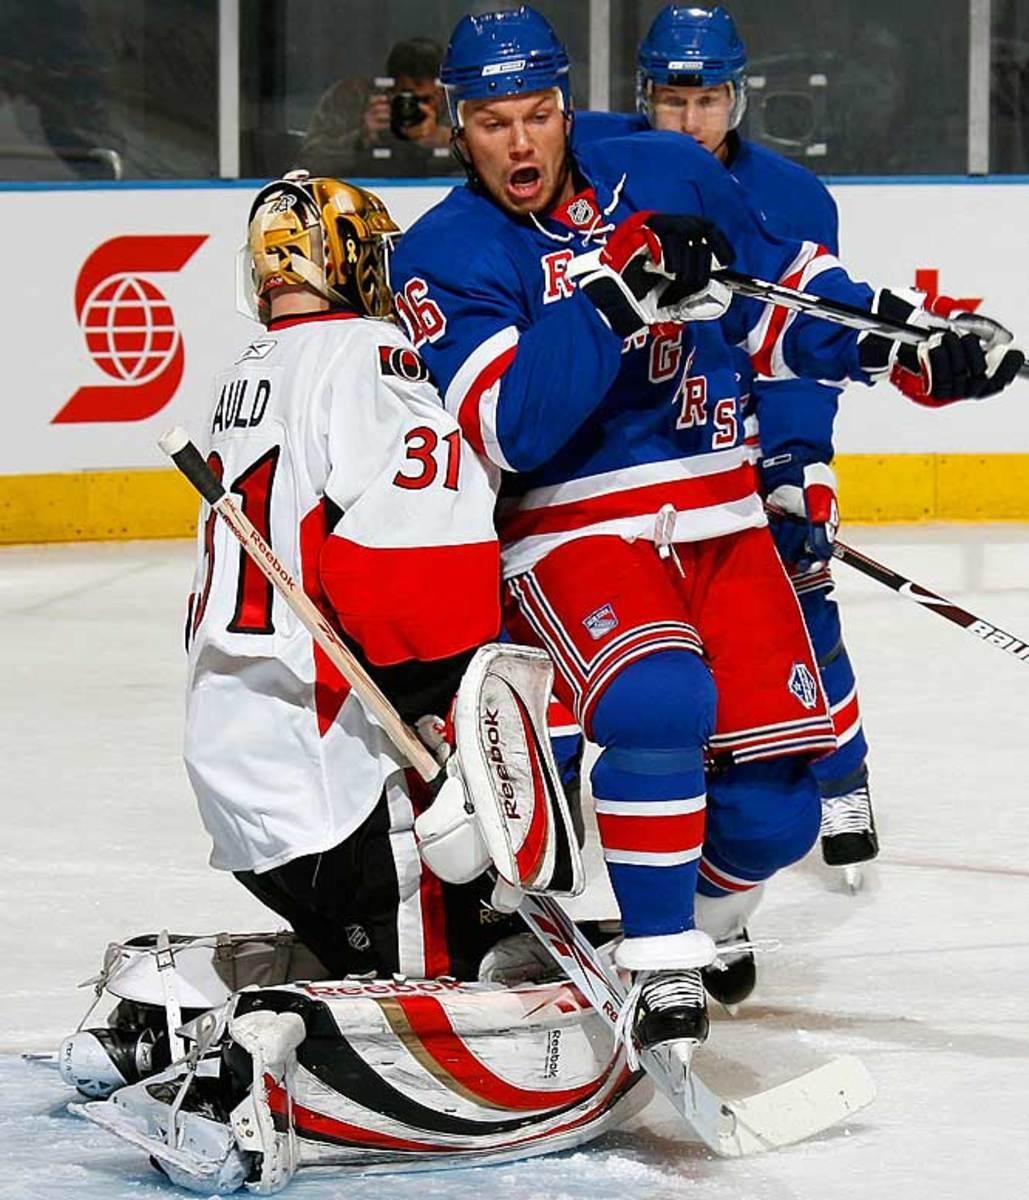 Sean Avery, left wing, New York Rangers